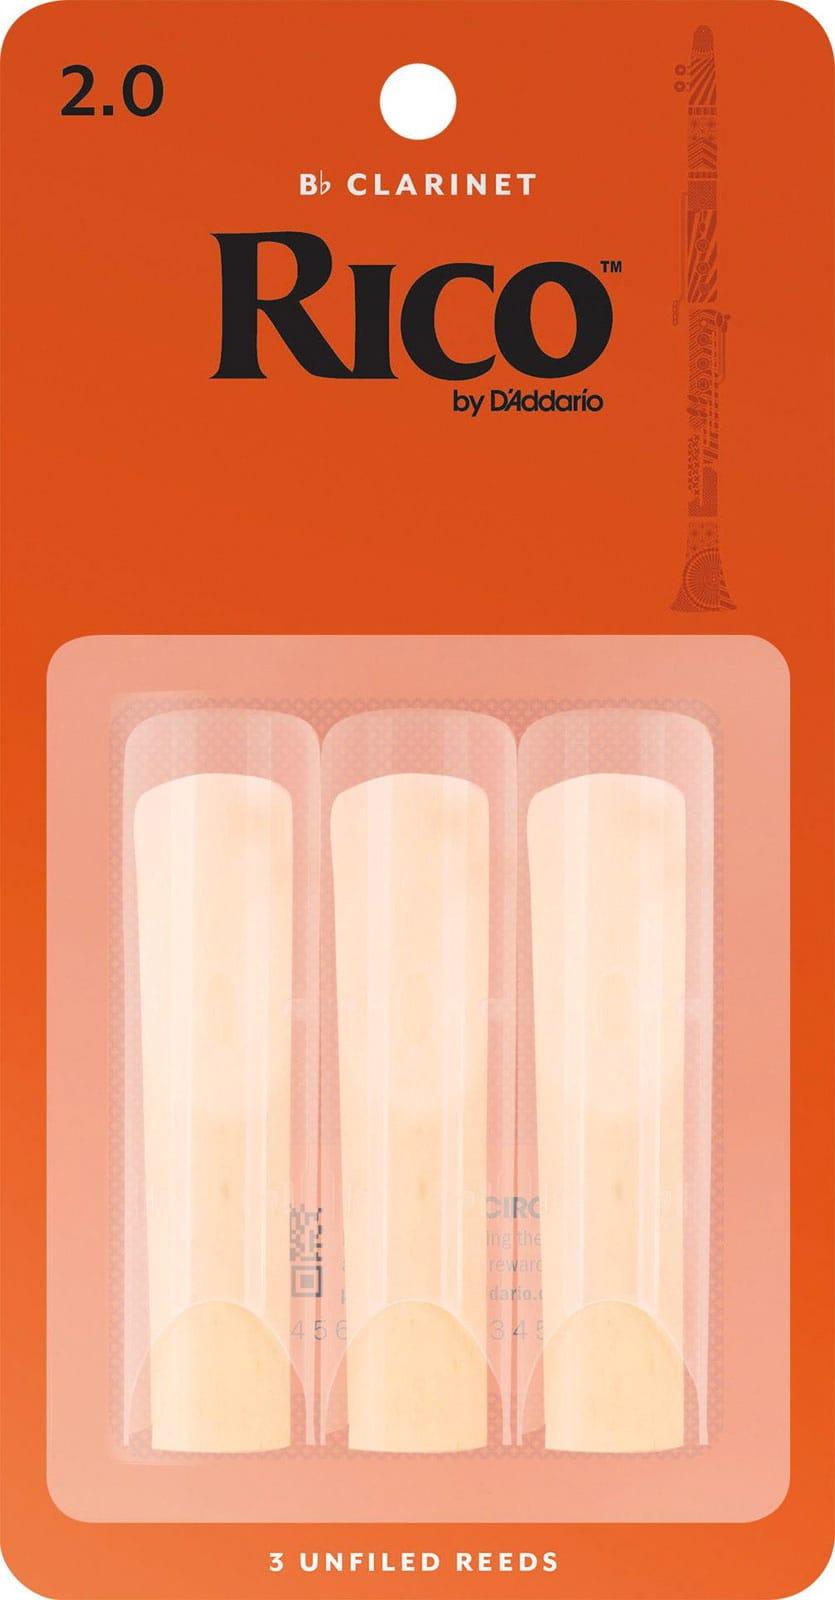 D'Addario Rico - Anches Clarinette Sib Force 2.0 - laflutedepan.com